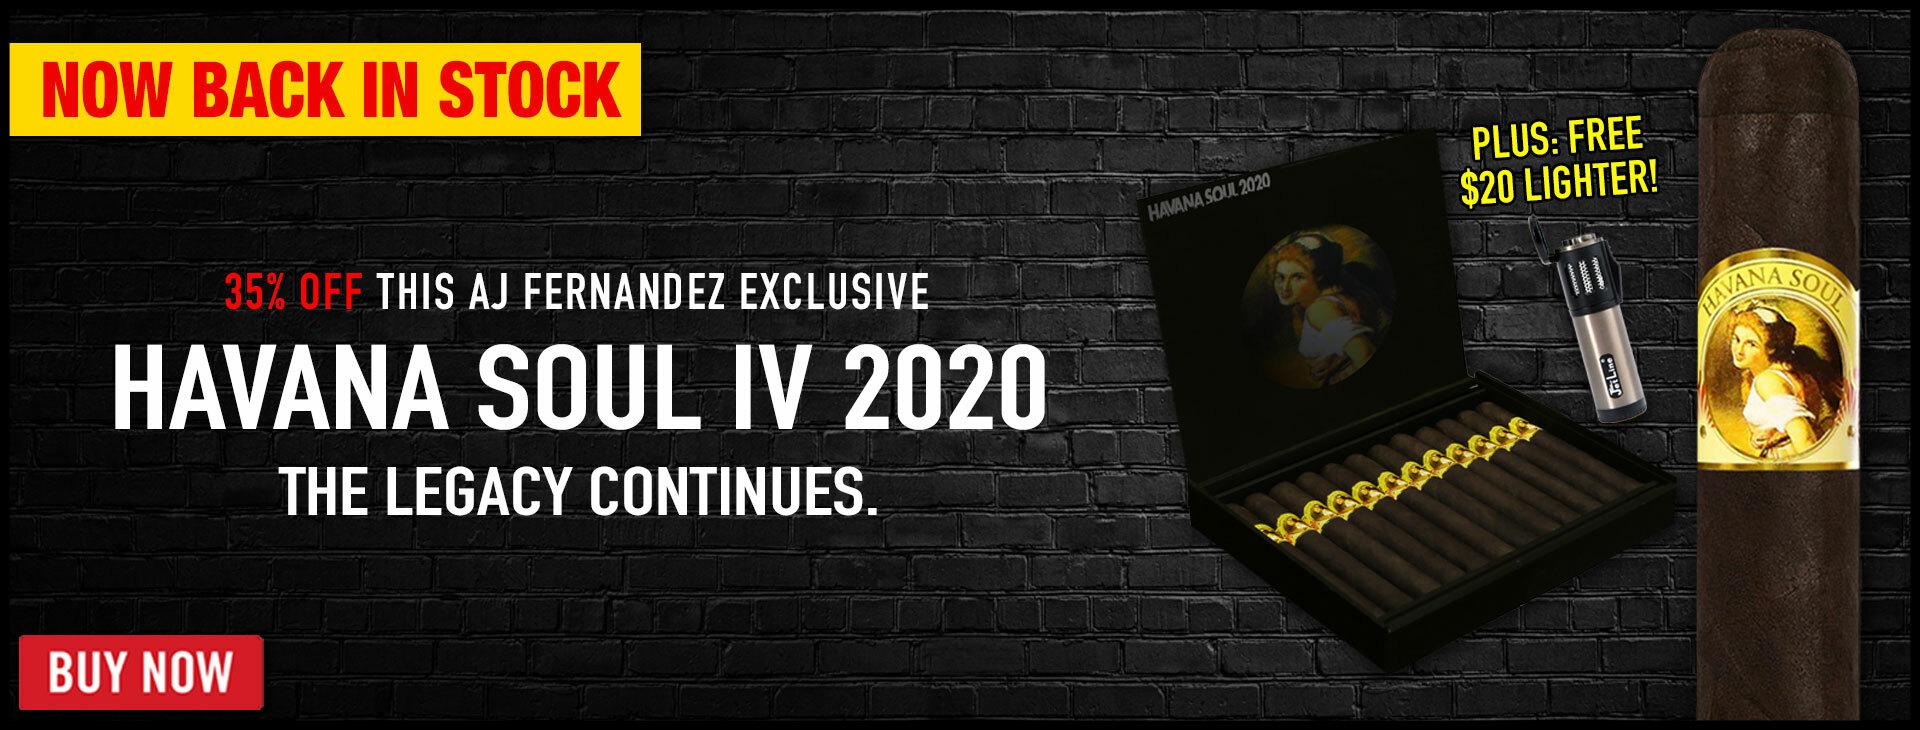 ITS BACK: RARE AJ FERNANDEZ HAVANA SOUL 2020